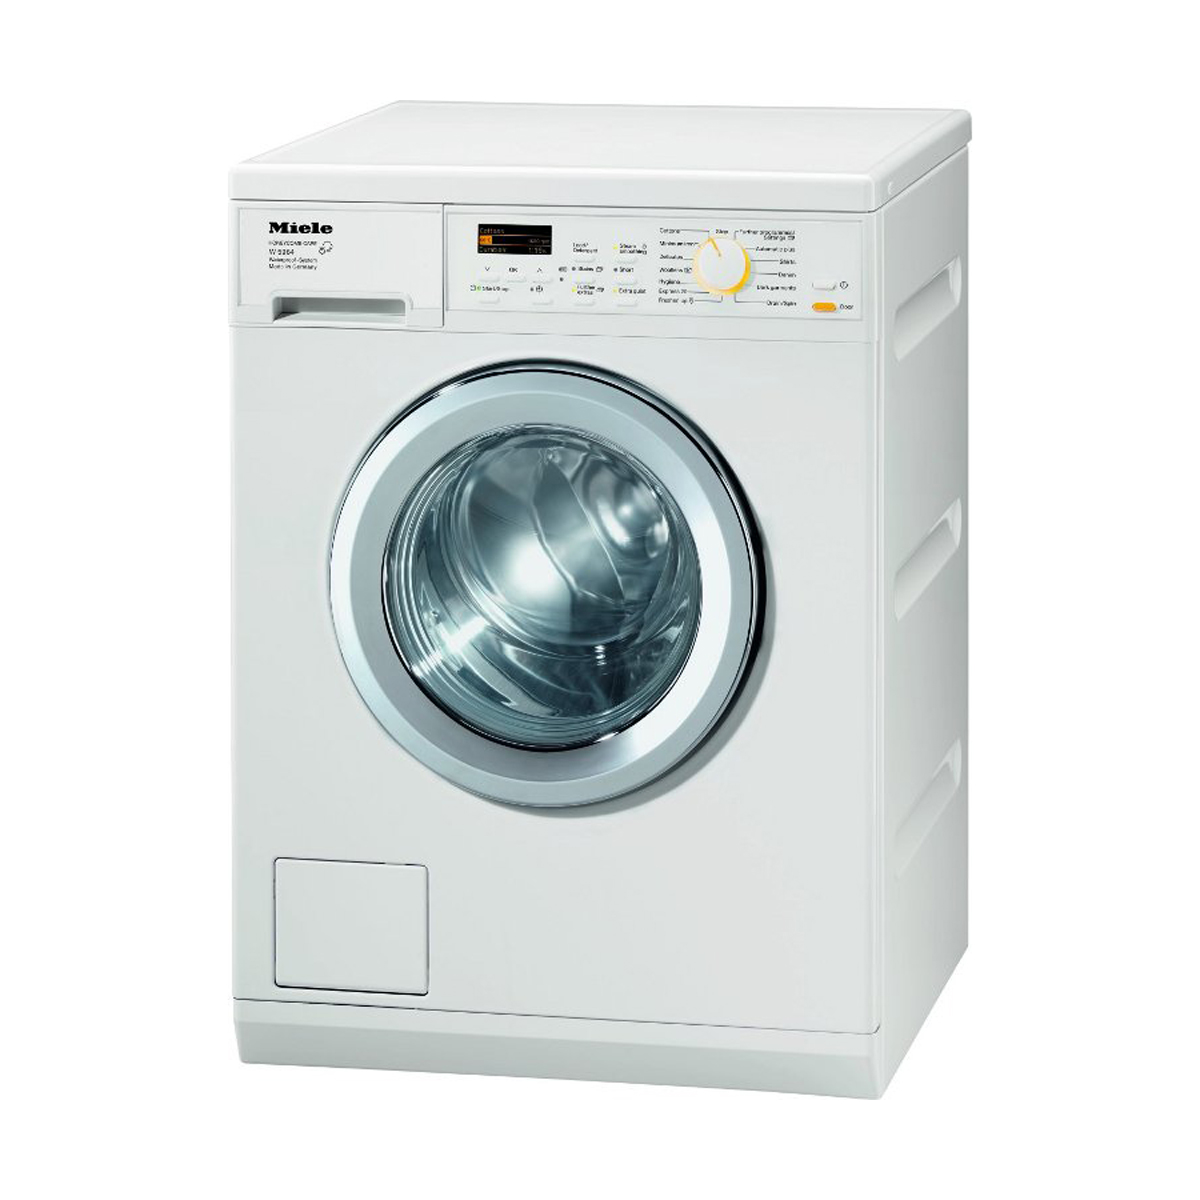 miele w 5964 wps major household appliances appliances online shop. Black Bedroom Furniture Sets. Home Design Ideas